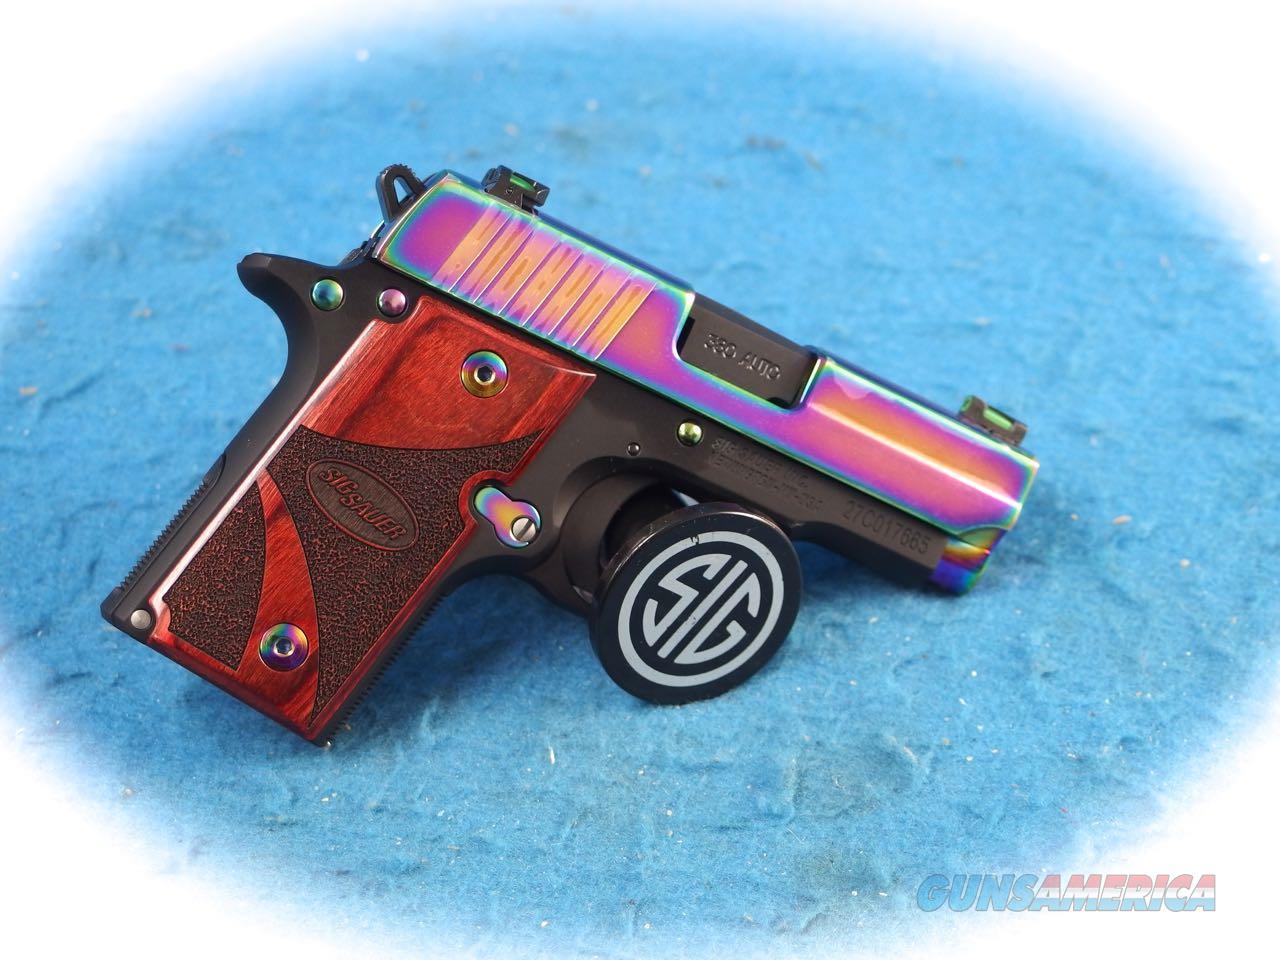 Sig Sauer P238 Rainbow .380 ACP Pistol **New**  Guns > Pistols > Sig - Sauer/Sigarms Pistols > P238